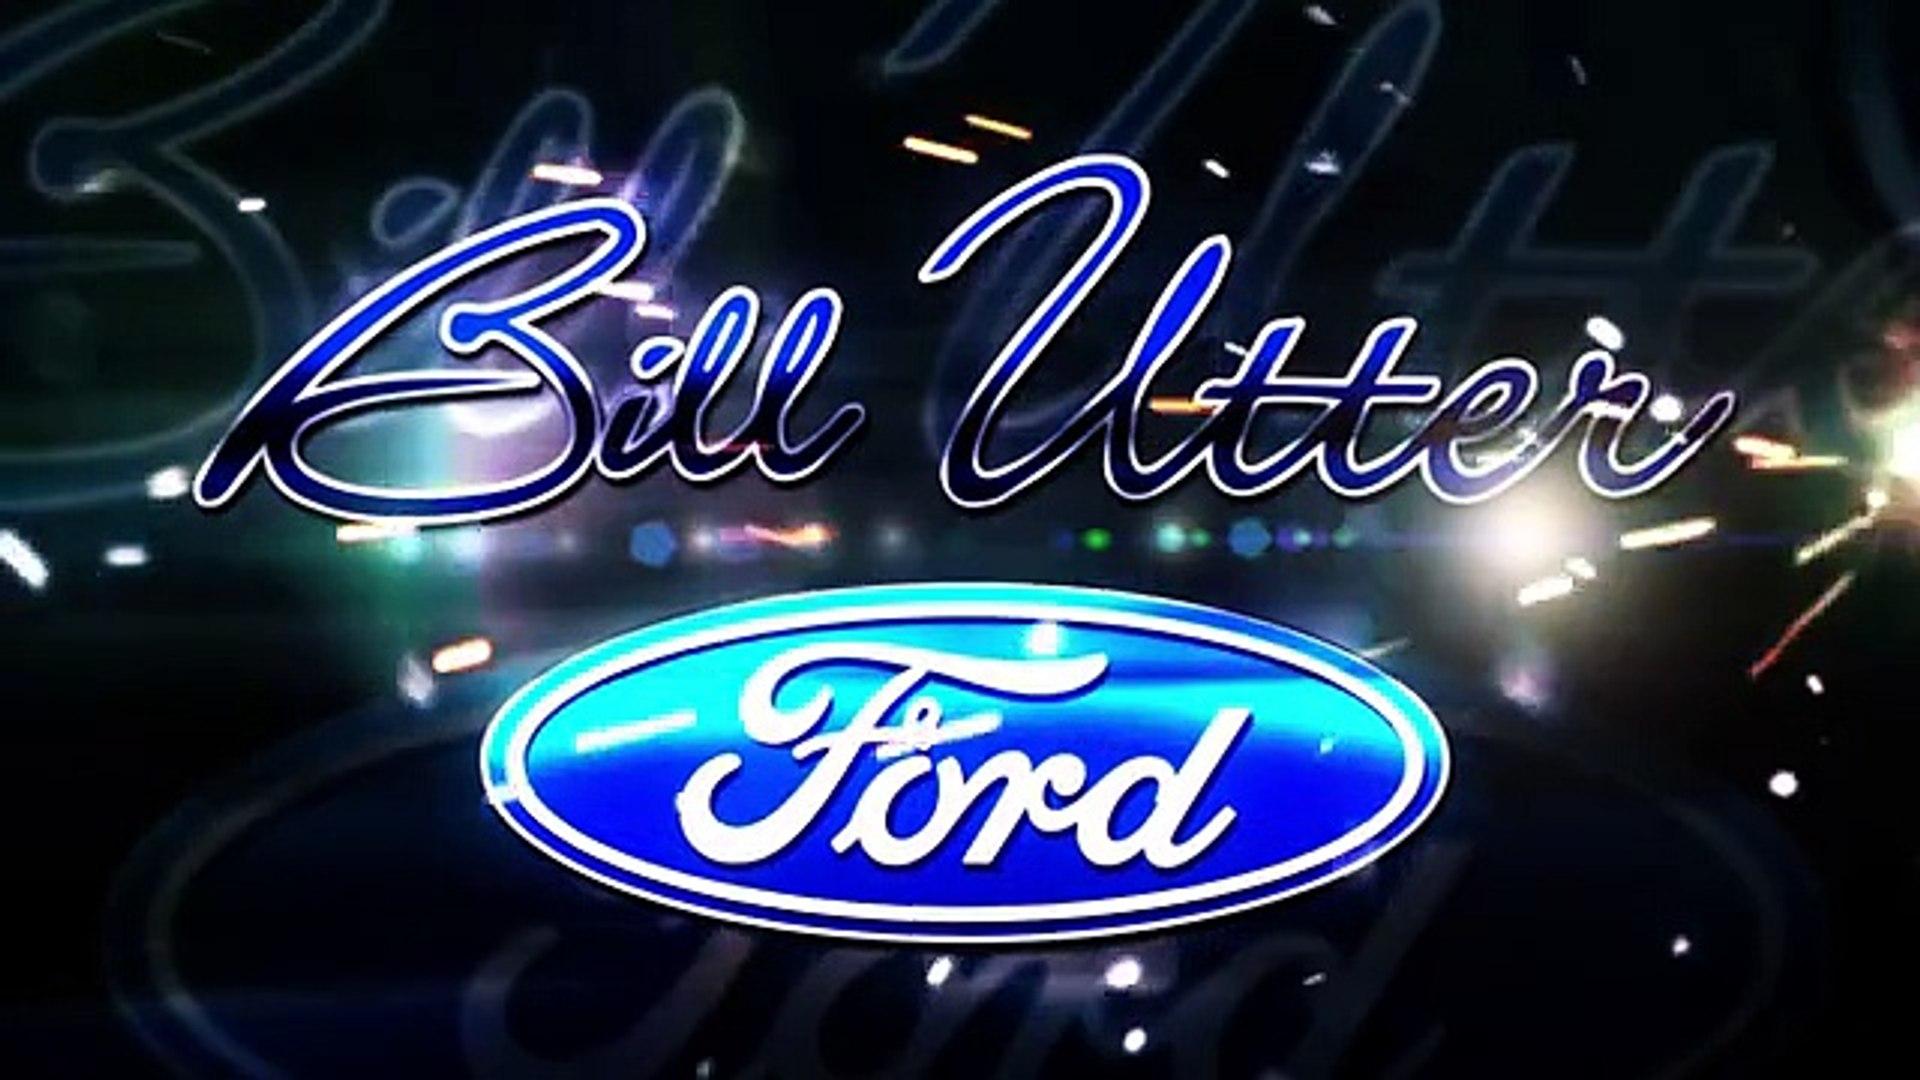 2017 Ford Flex Southlake, TX | Ford Flex Southlake, TX